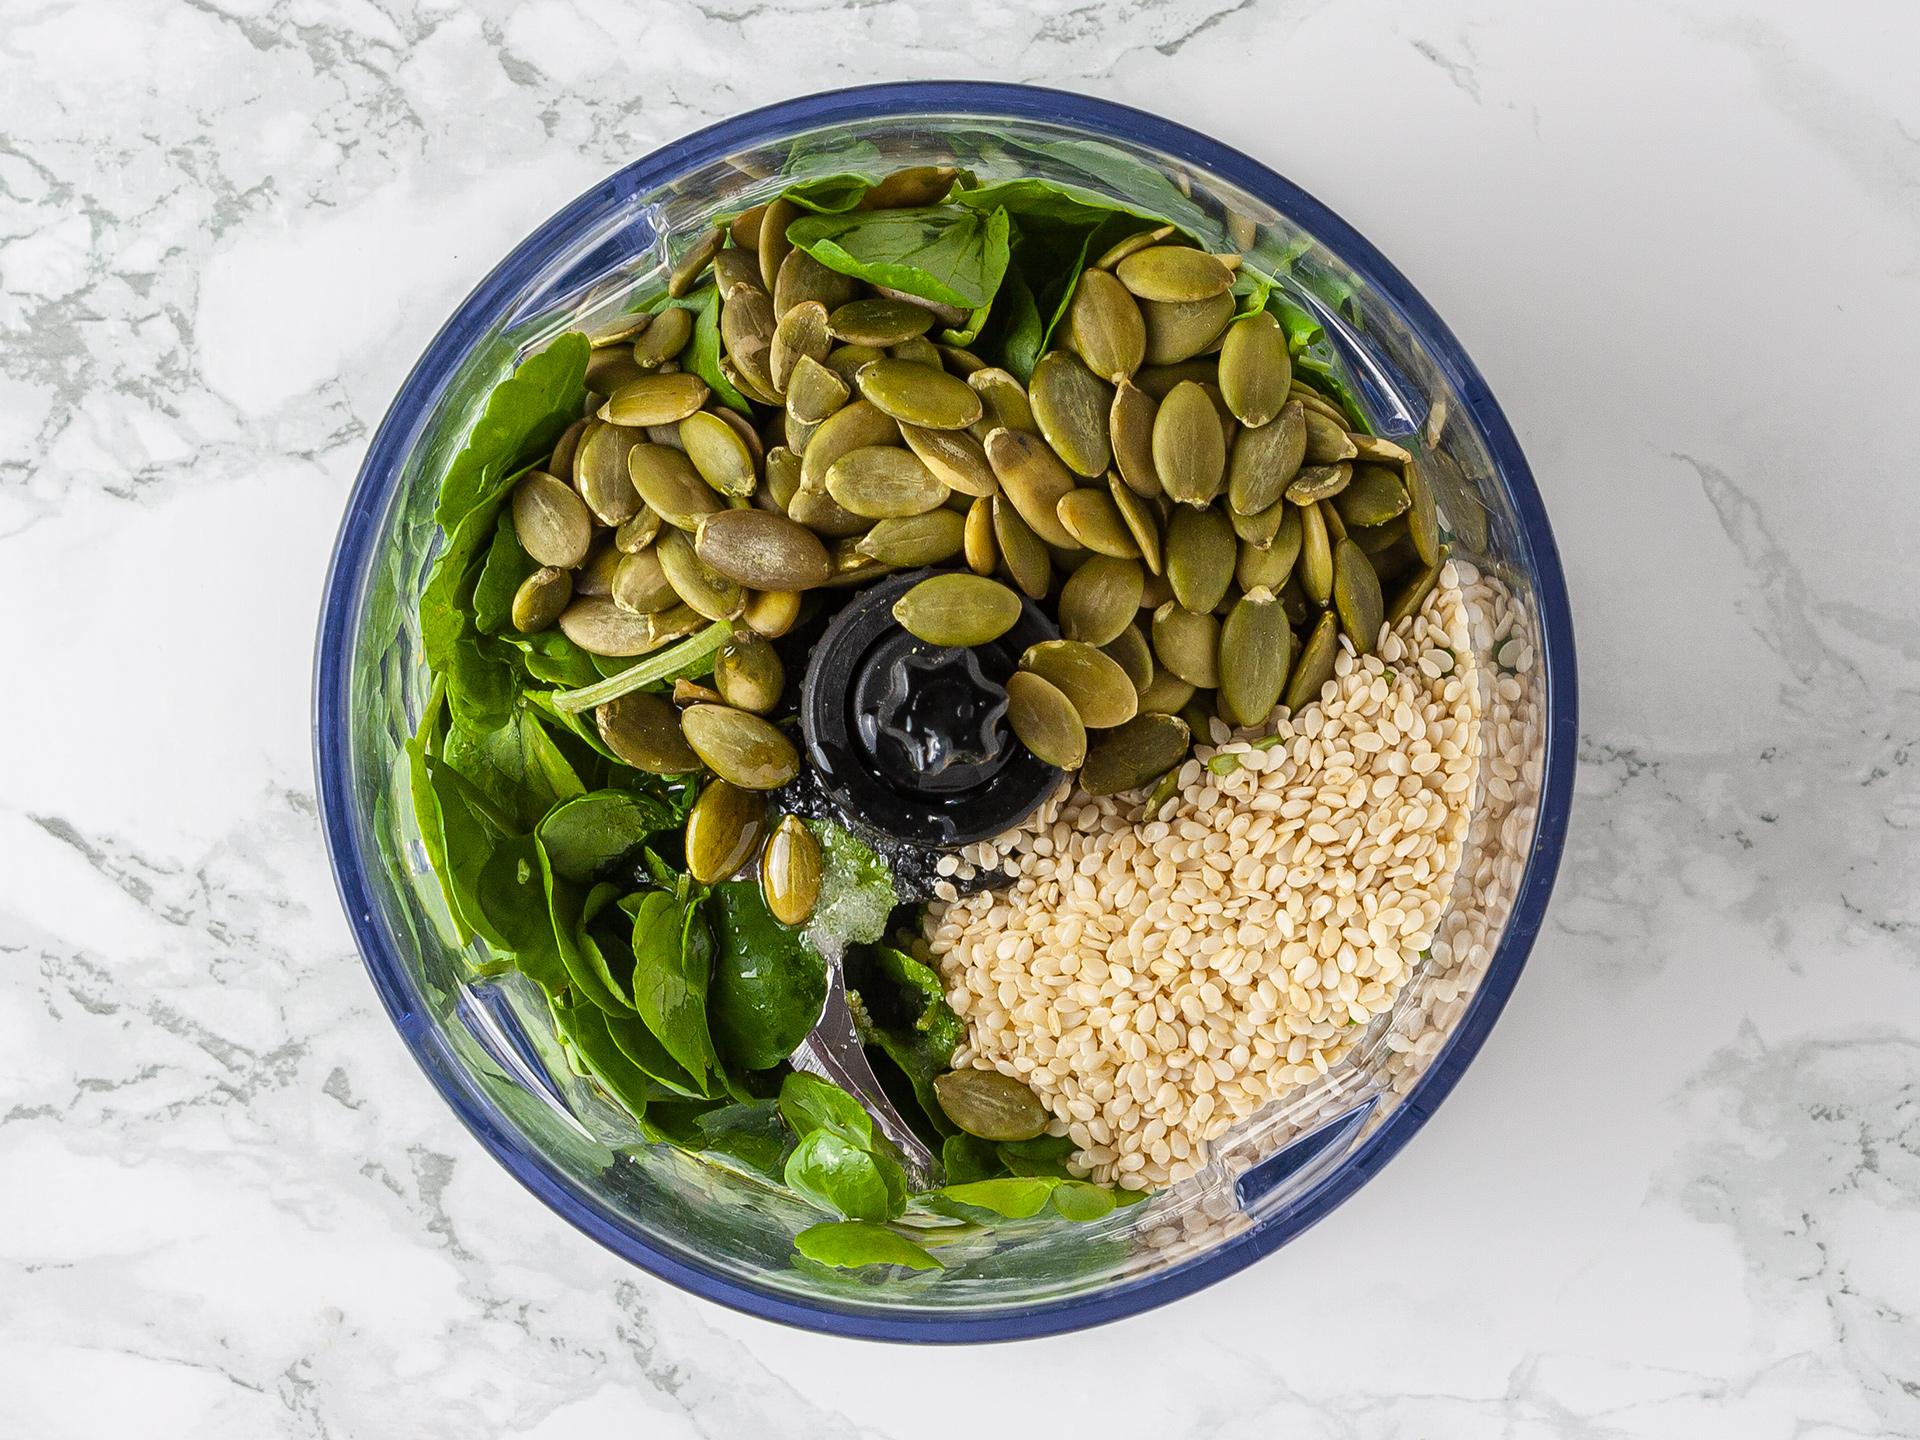 watercress, sunflower seeds, sesame seeds, lemon juice, and oil in a food processor to make pesto